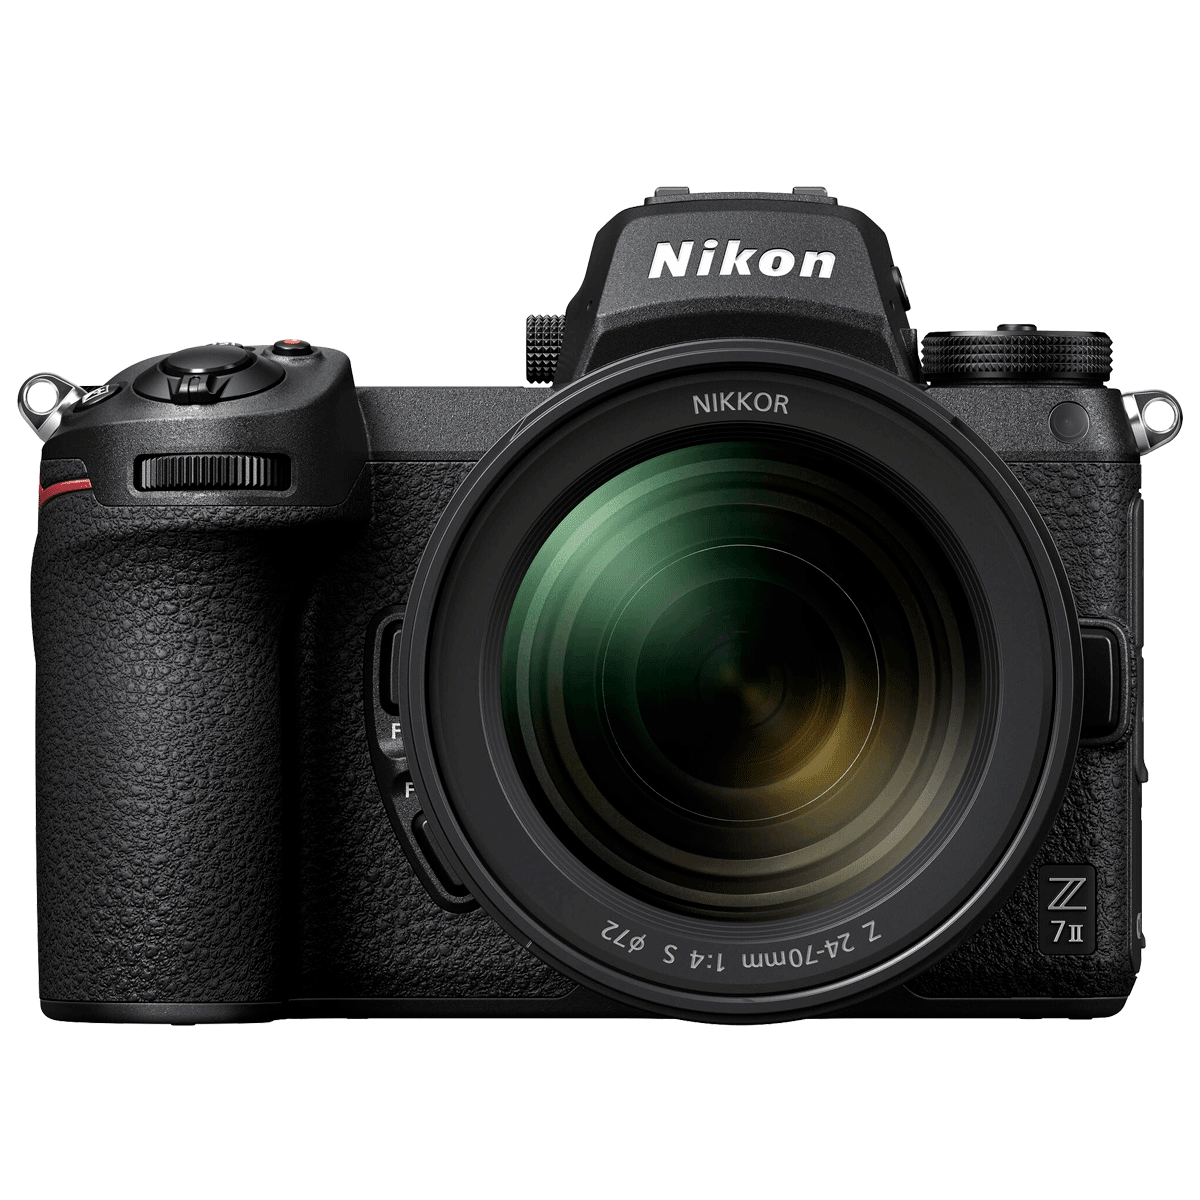 Nikon Z 7II 45.7MP Mirrorless Camera (24-70mm Lens, Dust-Reduction System, VOK070XN, Black)